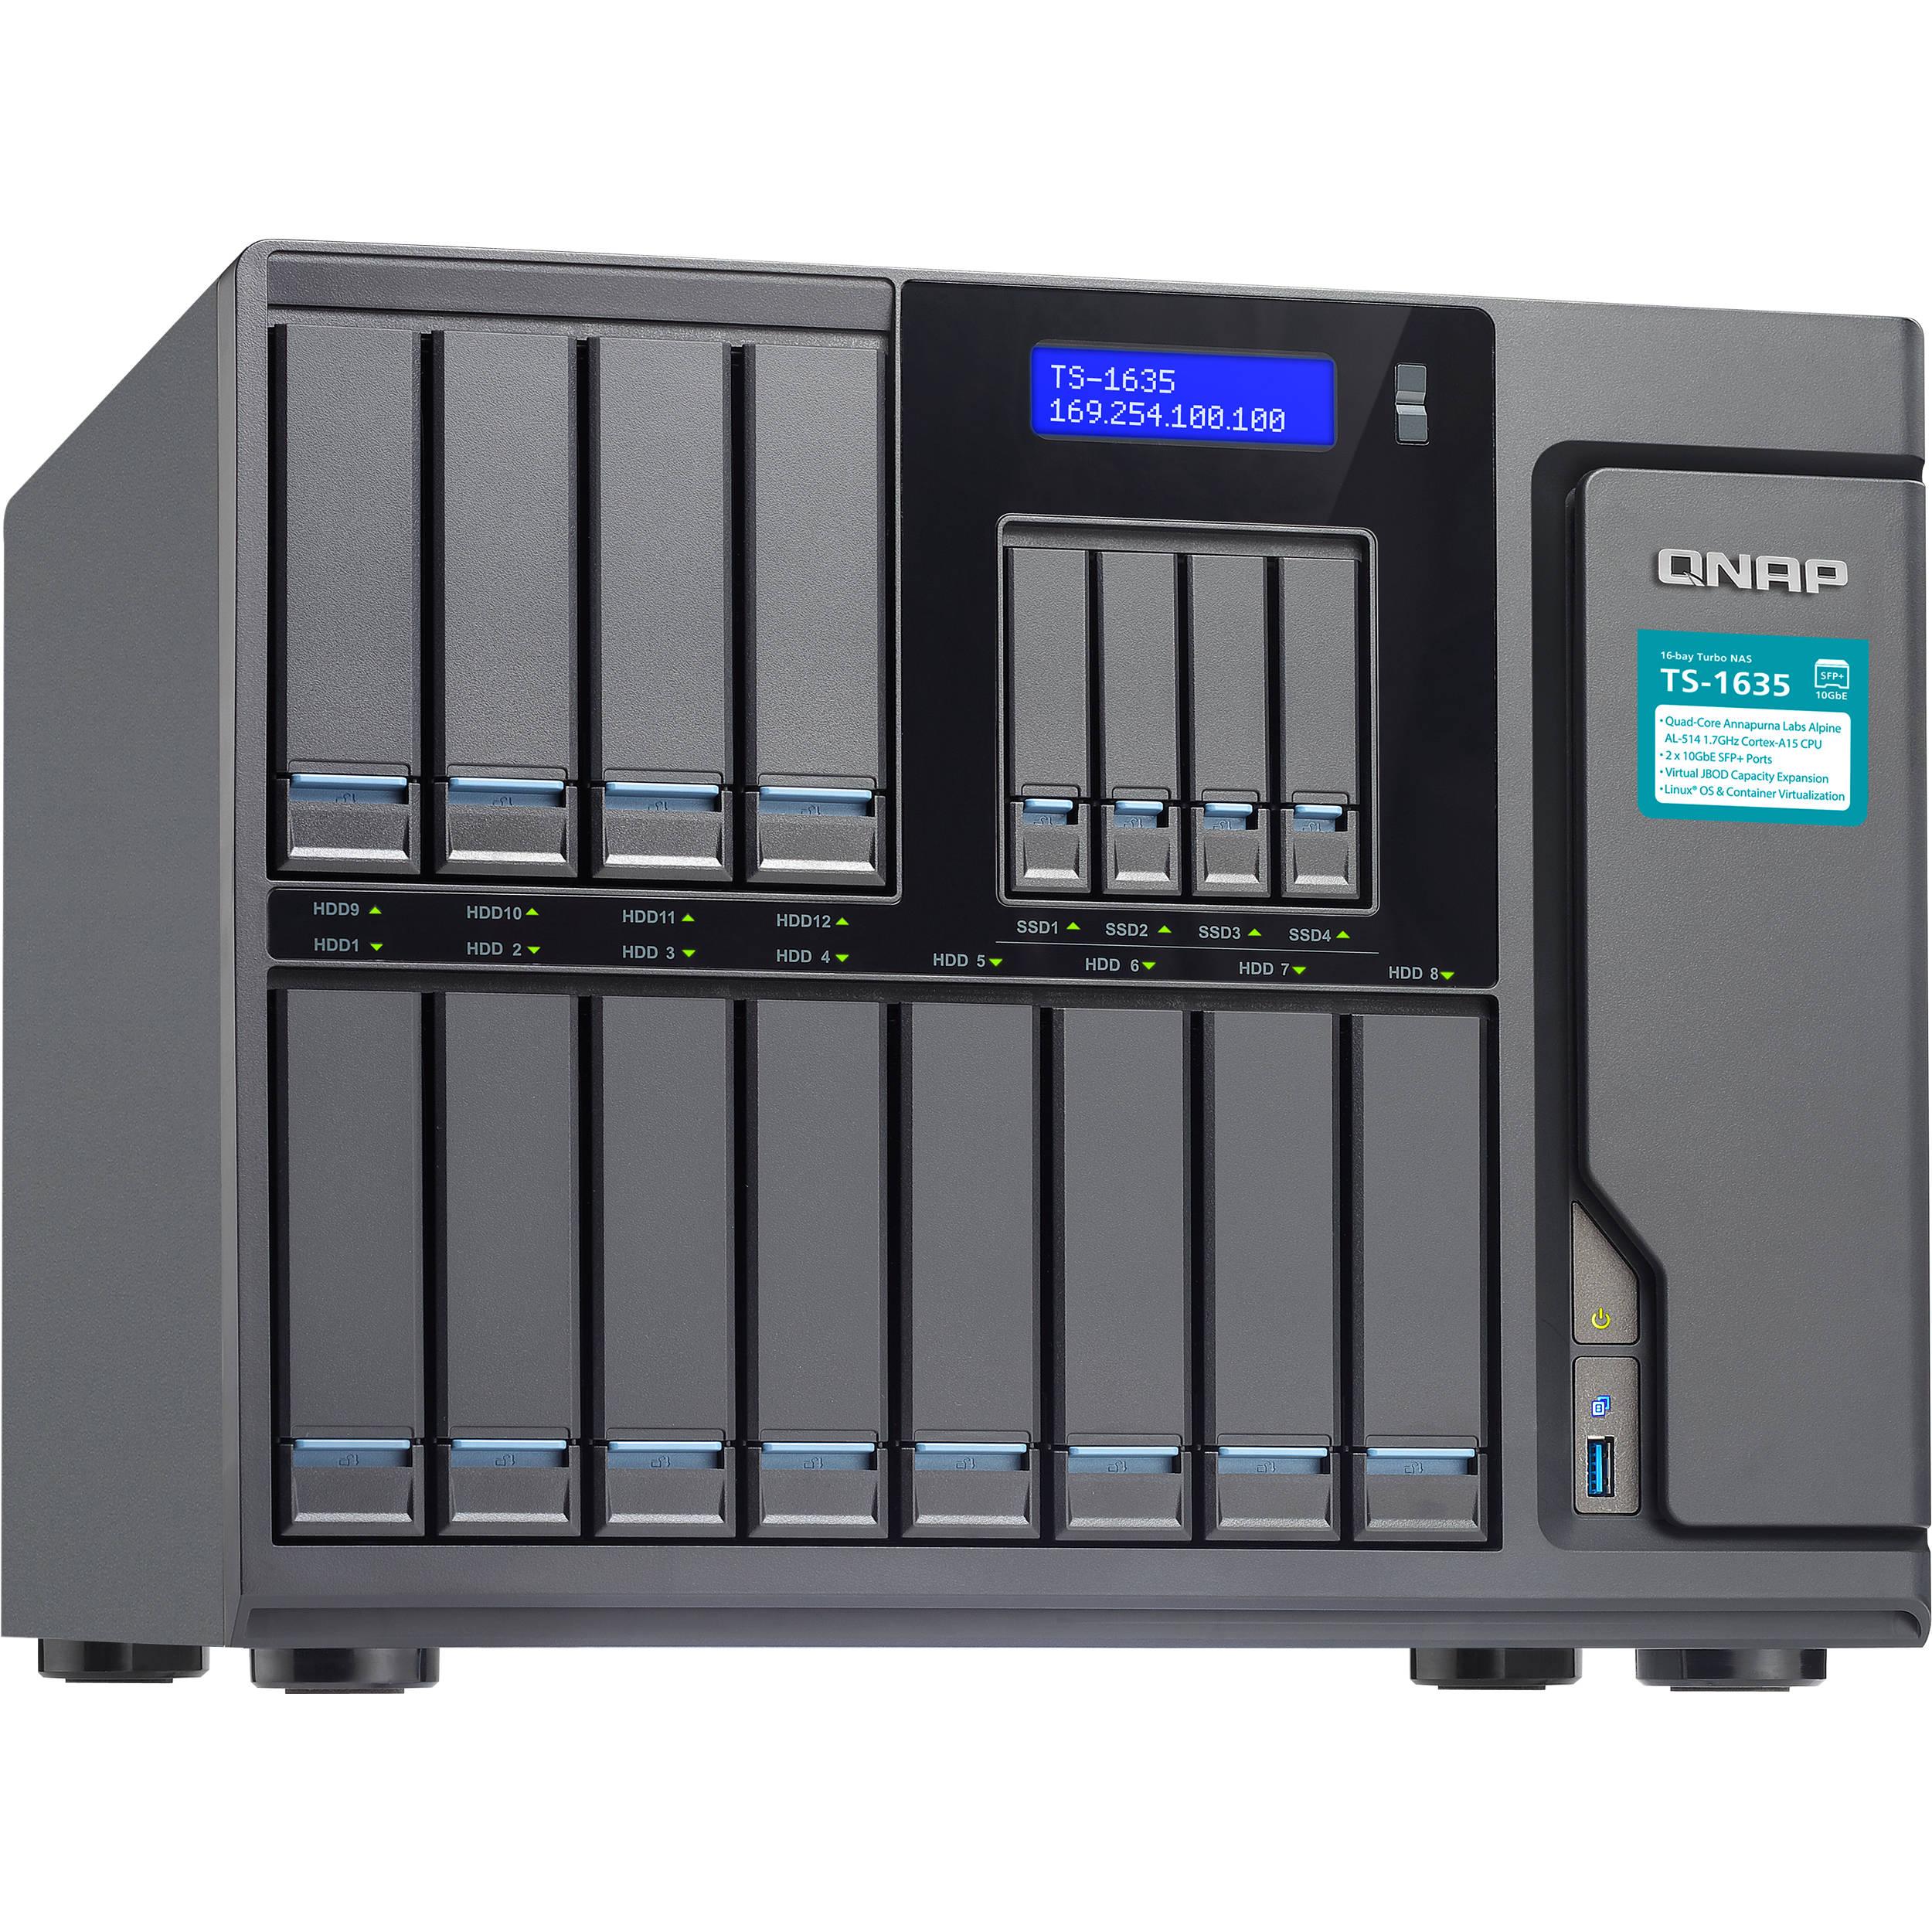 QNAP TS-1635-4G (1,7G/4GB RAM/16xSATA)